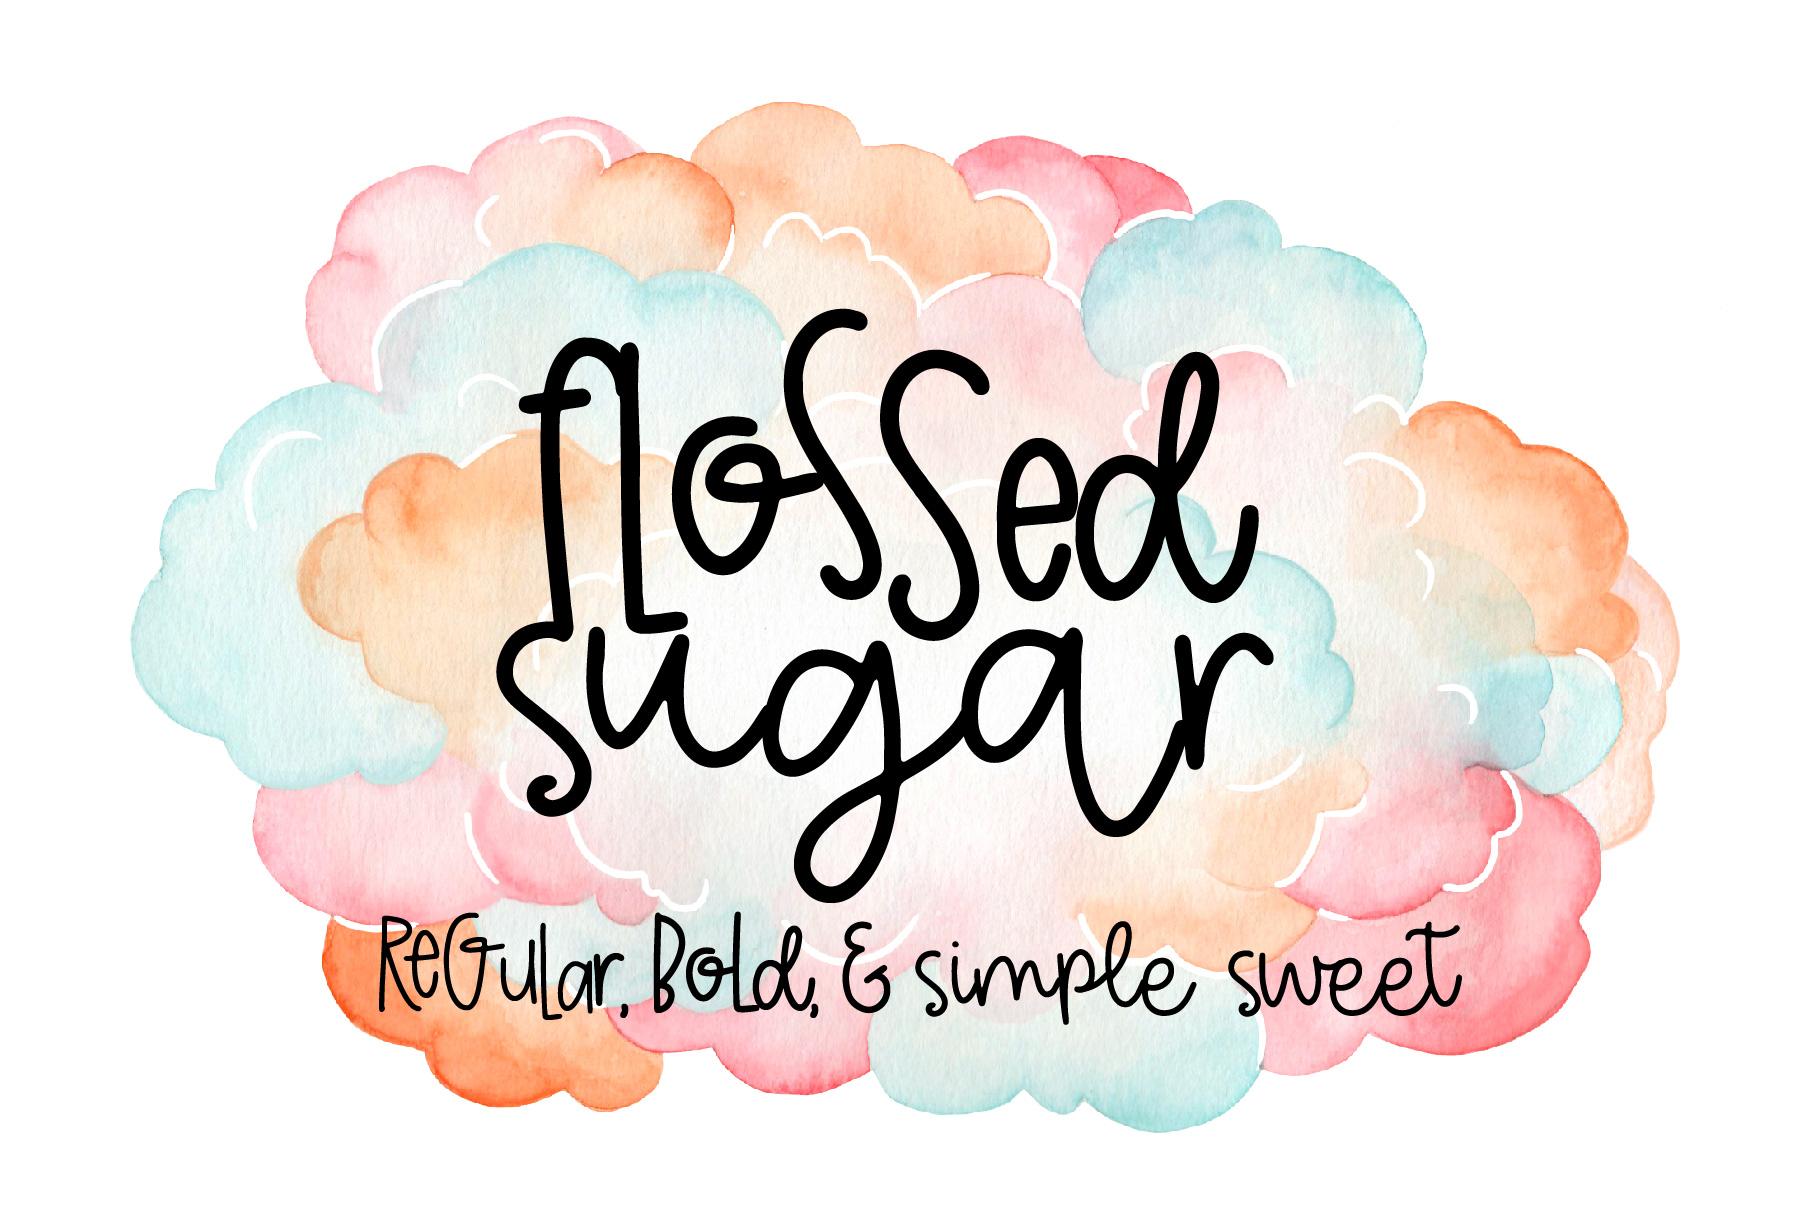 Flossed Sugar example image 5